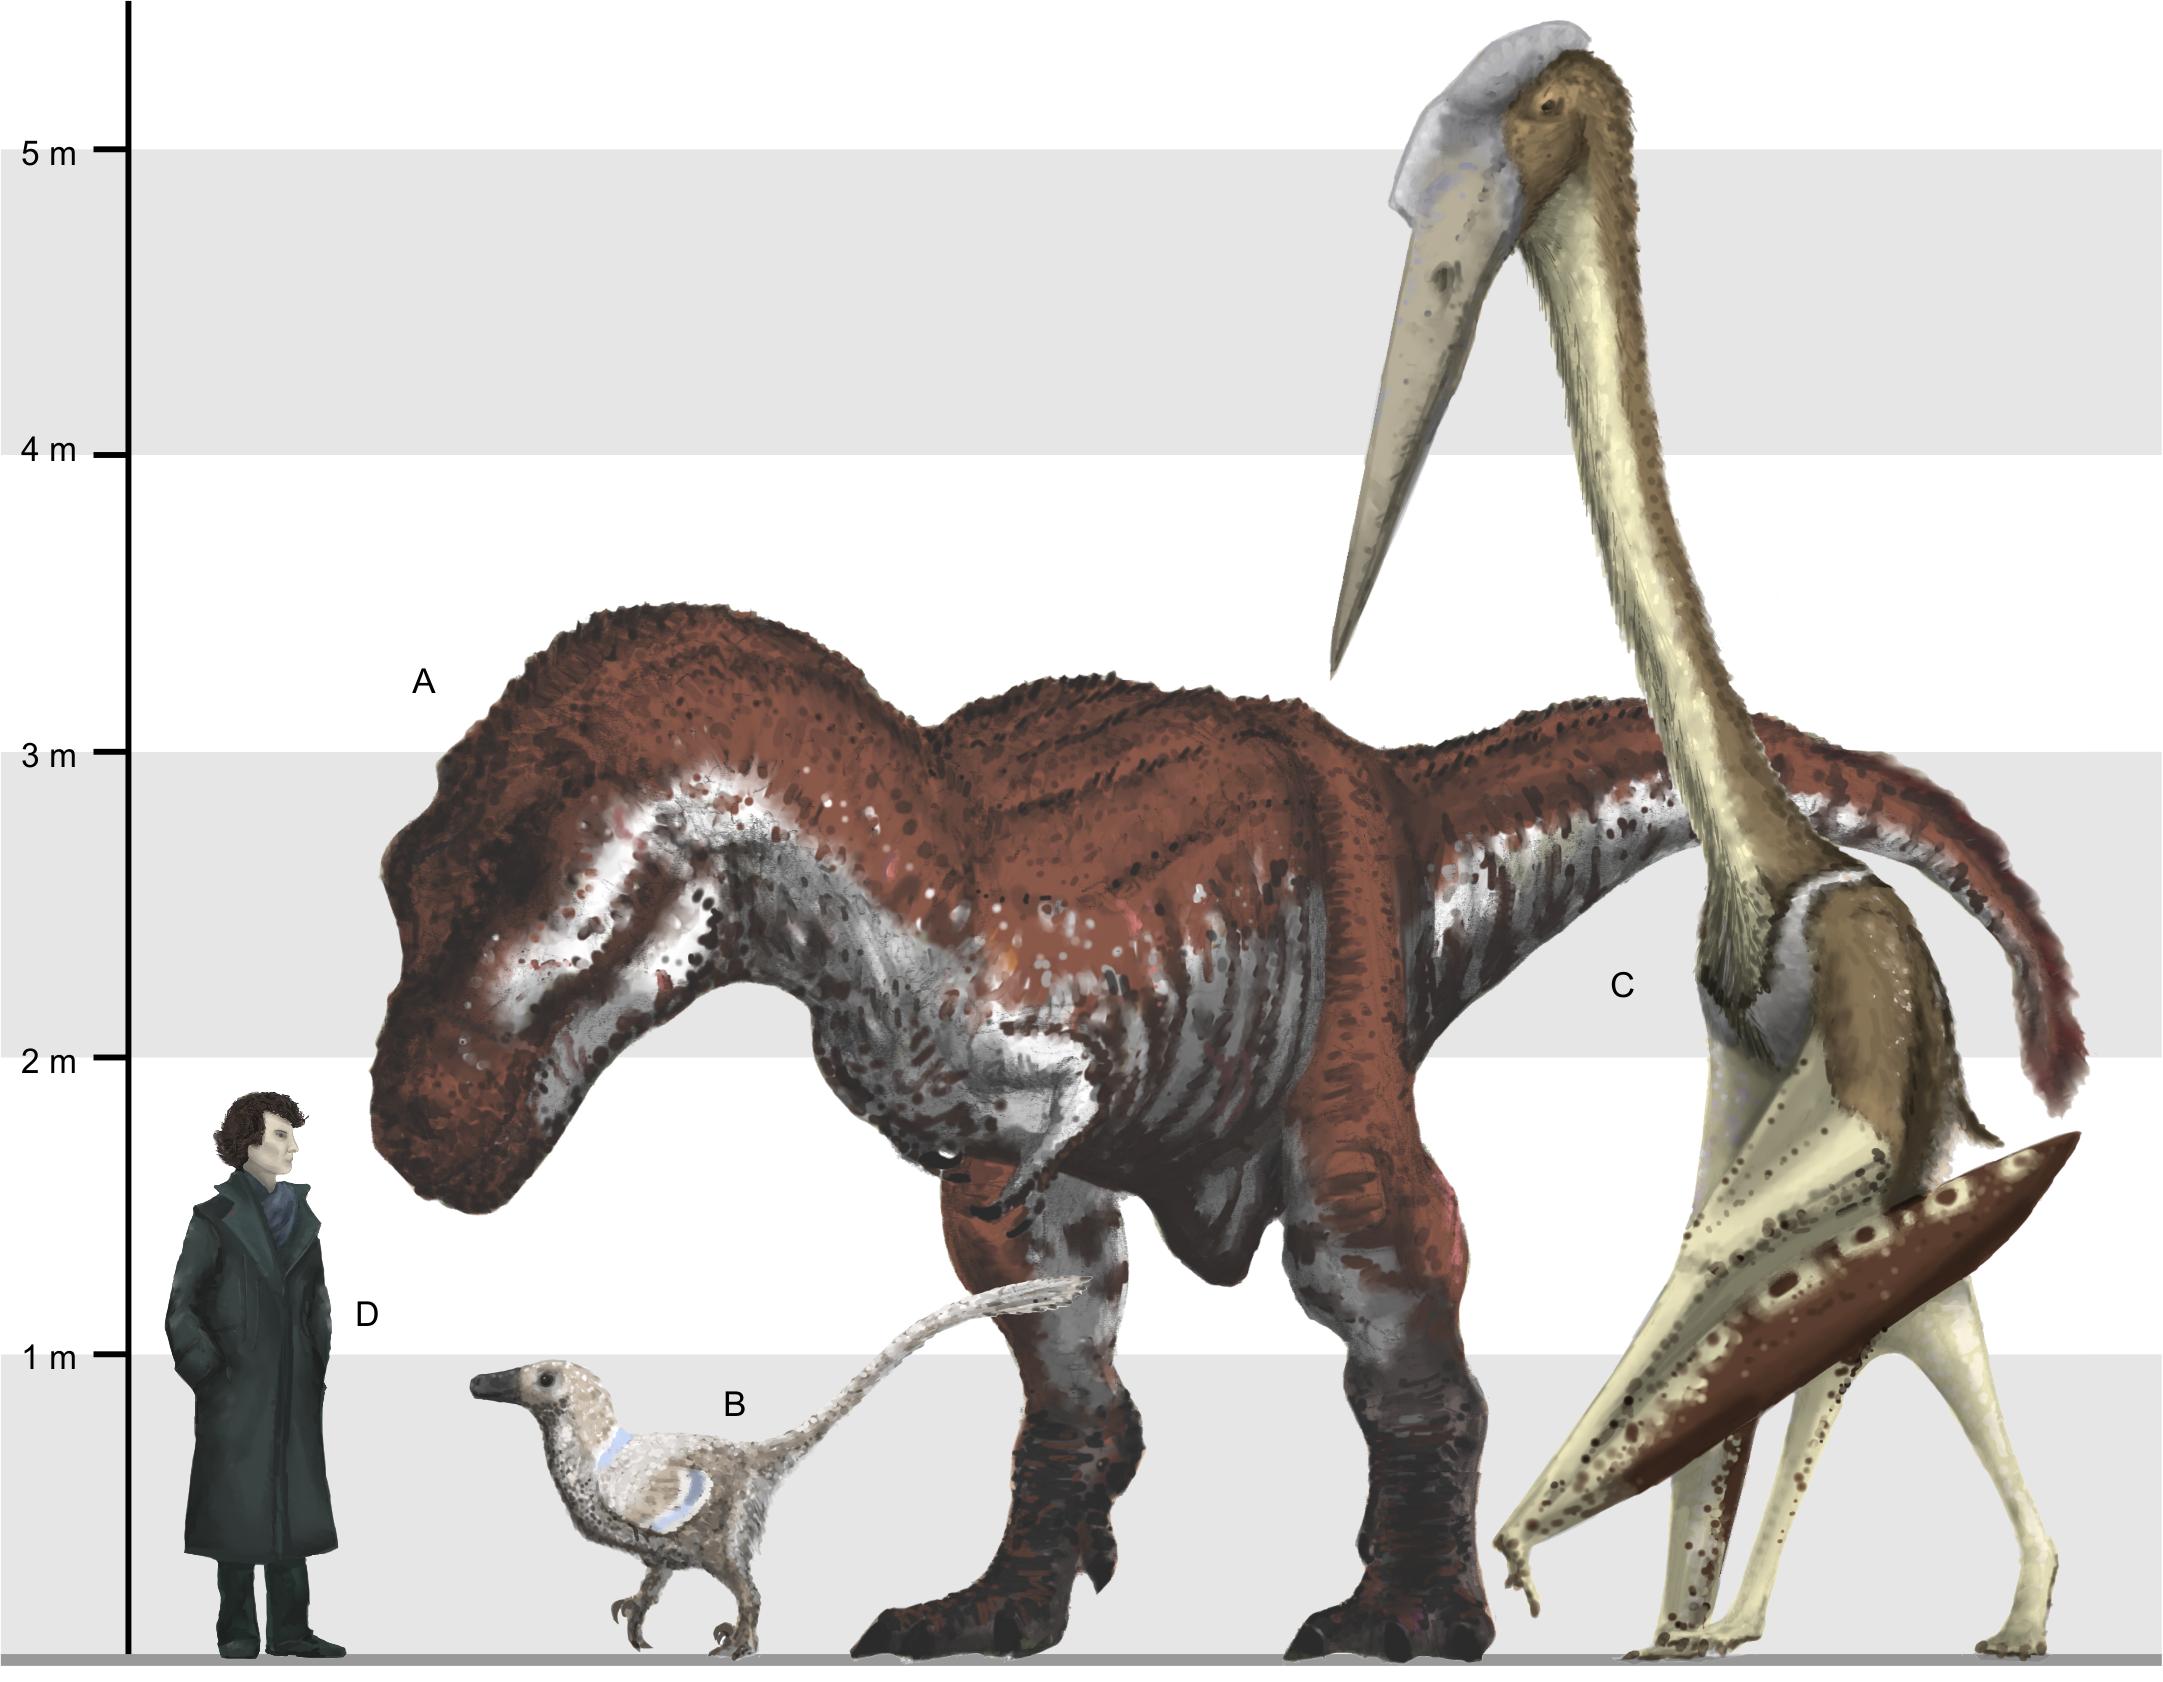 A)  Tyrannosaurus ; B) Small raptor  Balaur bondoc ; C) Azhdarchid pterosaur,  Arambourgiania philadelphie ; D) Human  Image by Mark Witton